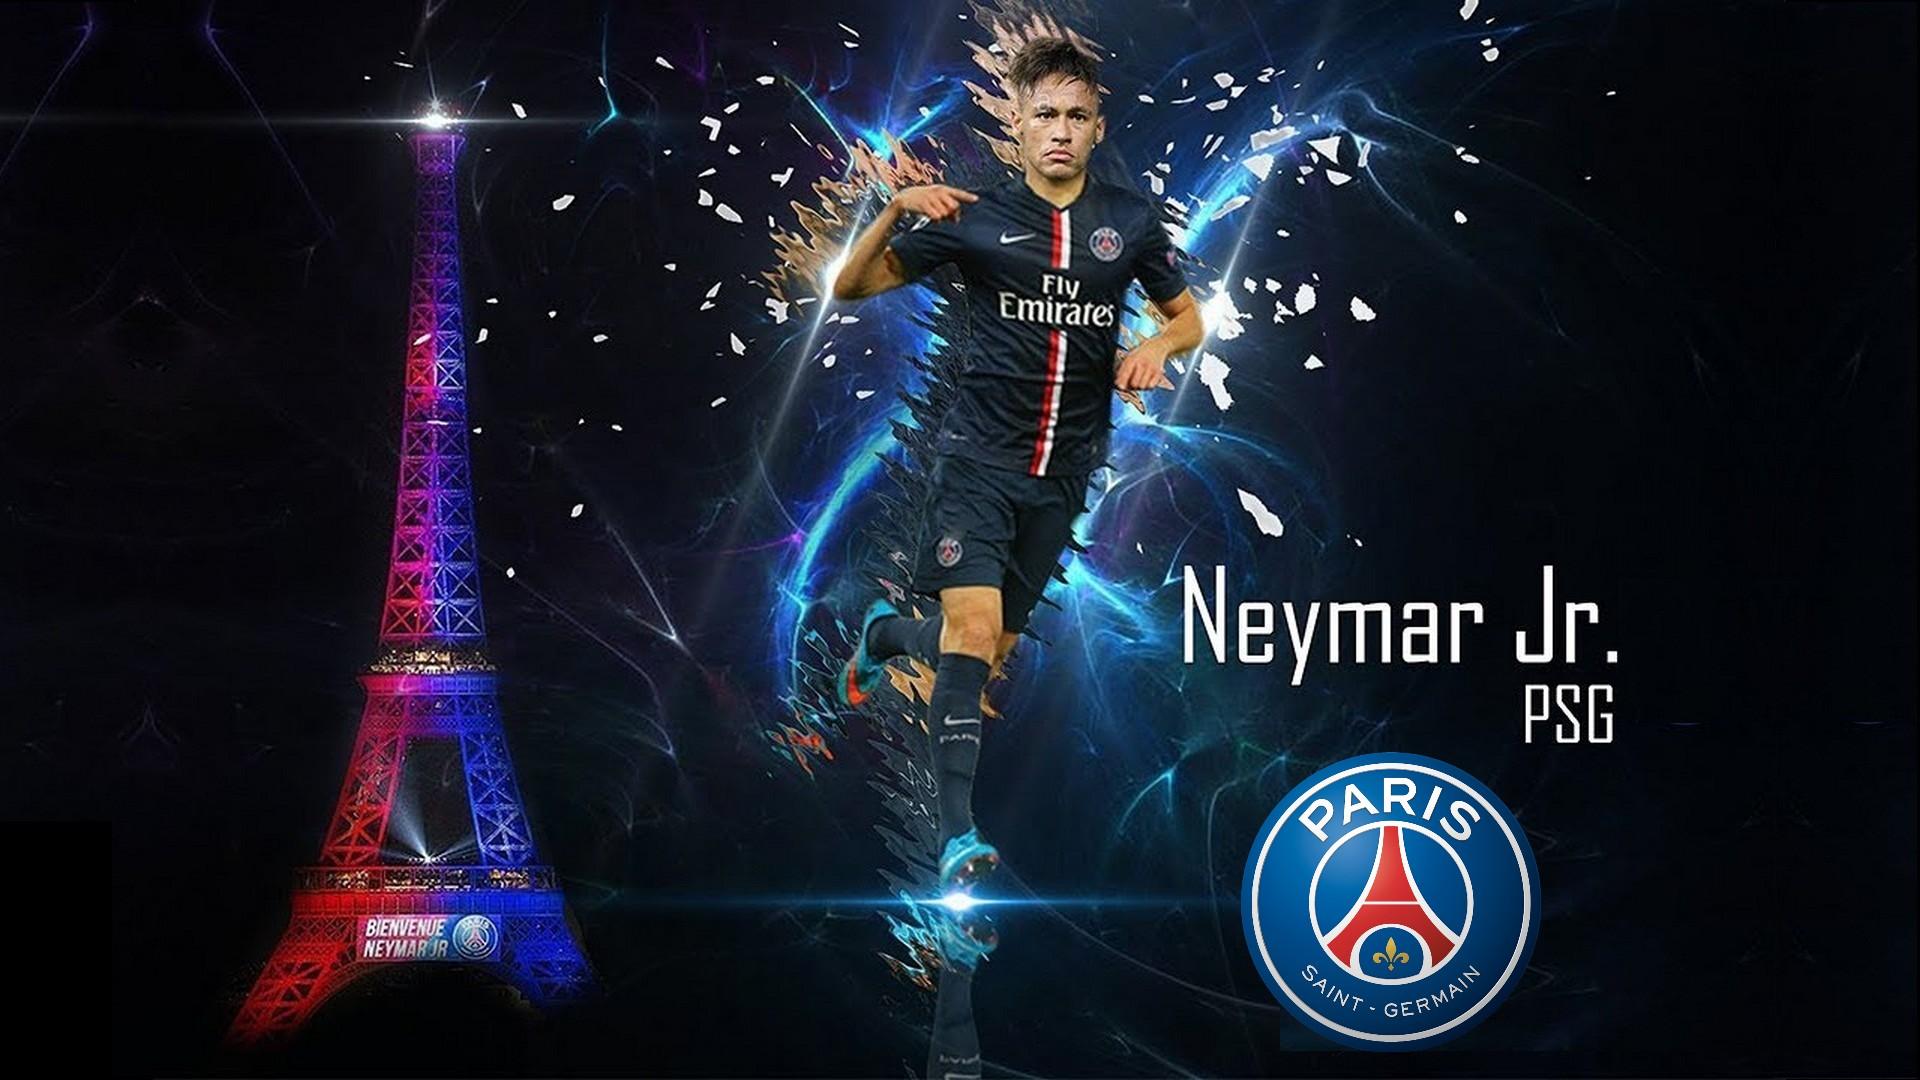 wallpapers hd neymar paris saint